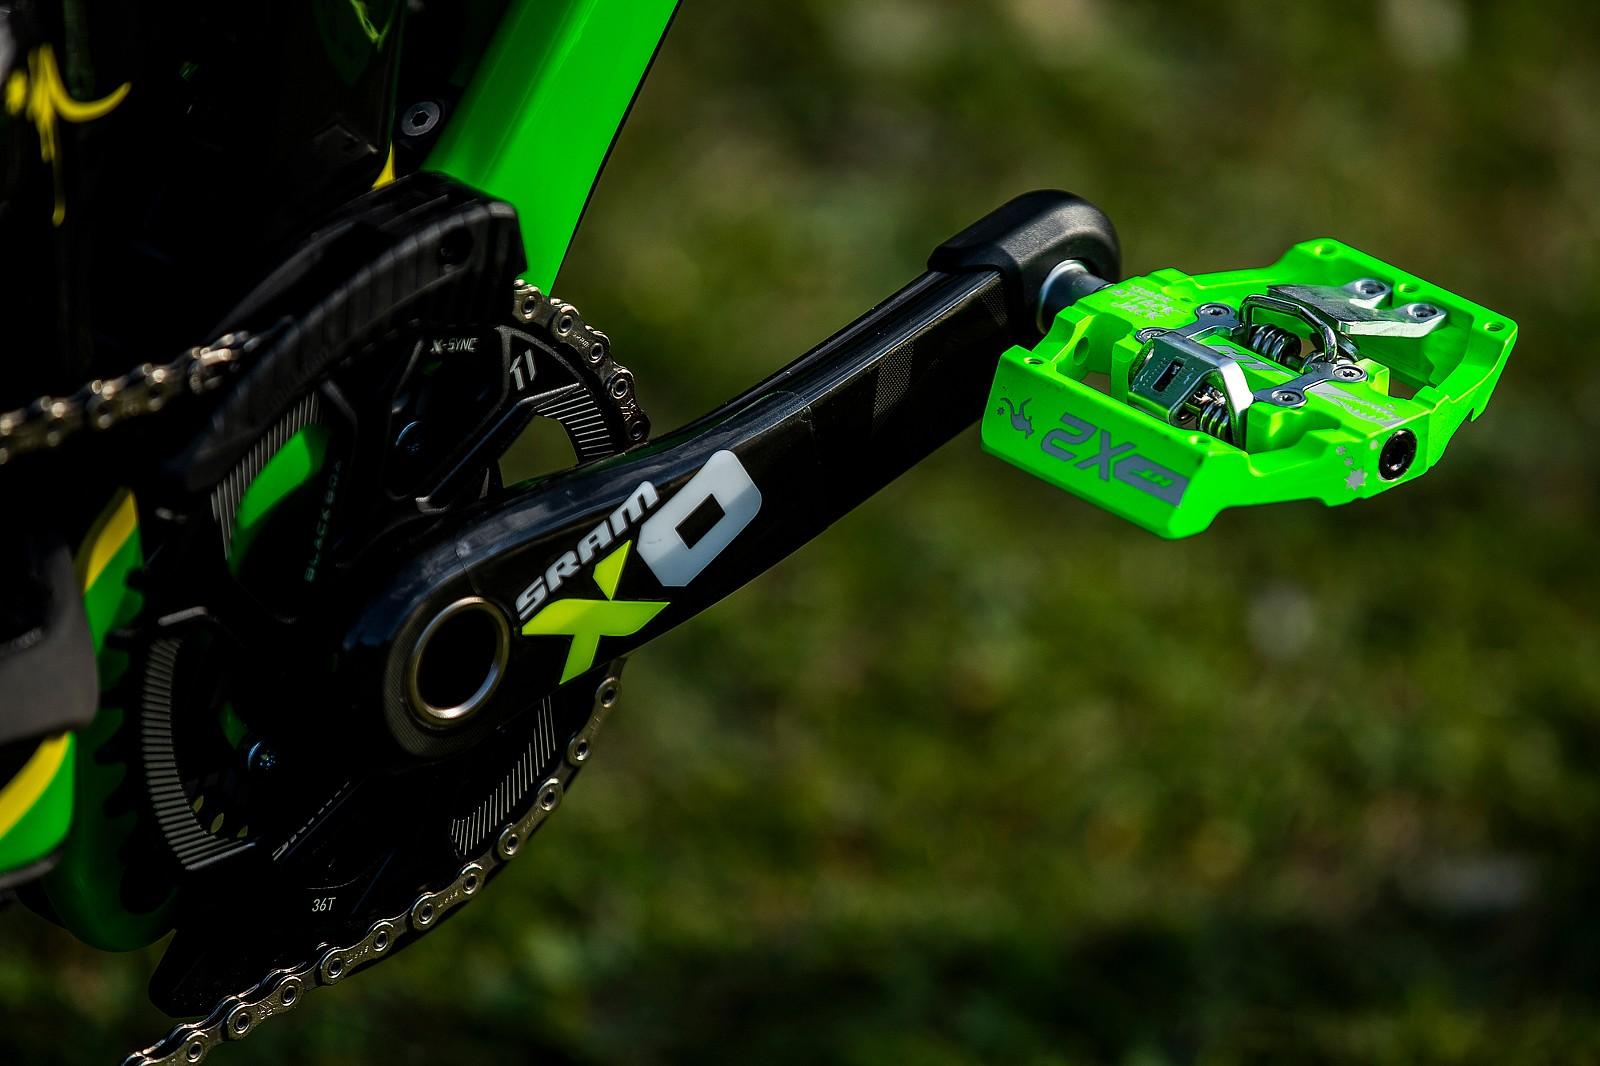 XO Cranks - WORLD CHAMPS BIKE - Jack Moir's Intense M29 - Mountain Biking Pictures - Vital MTB